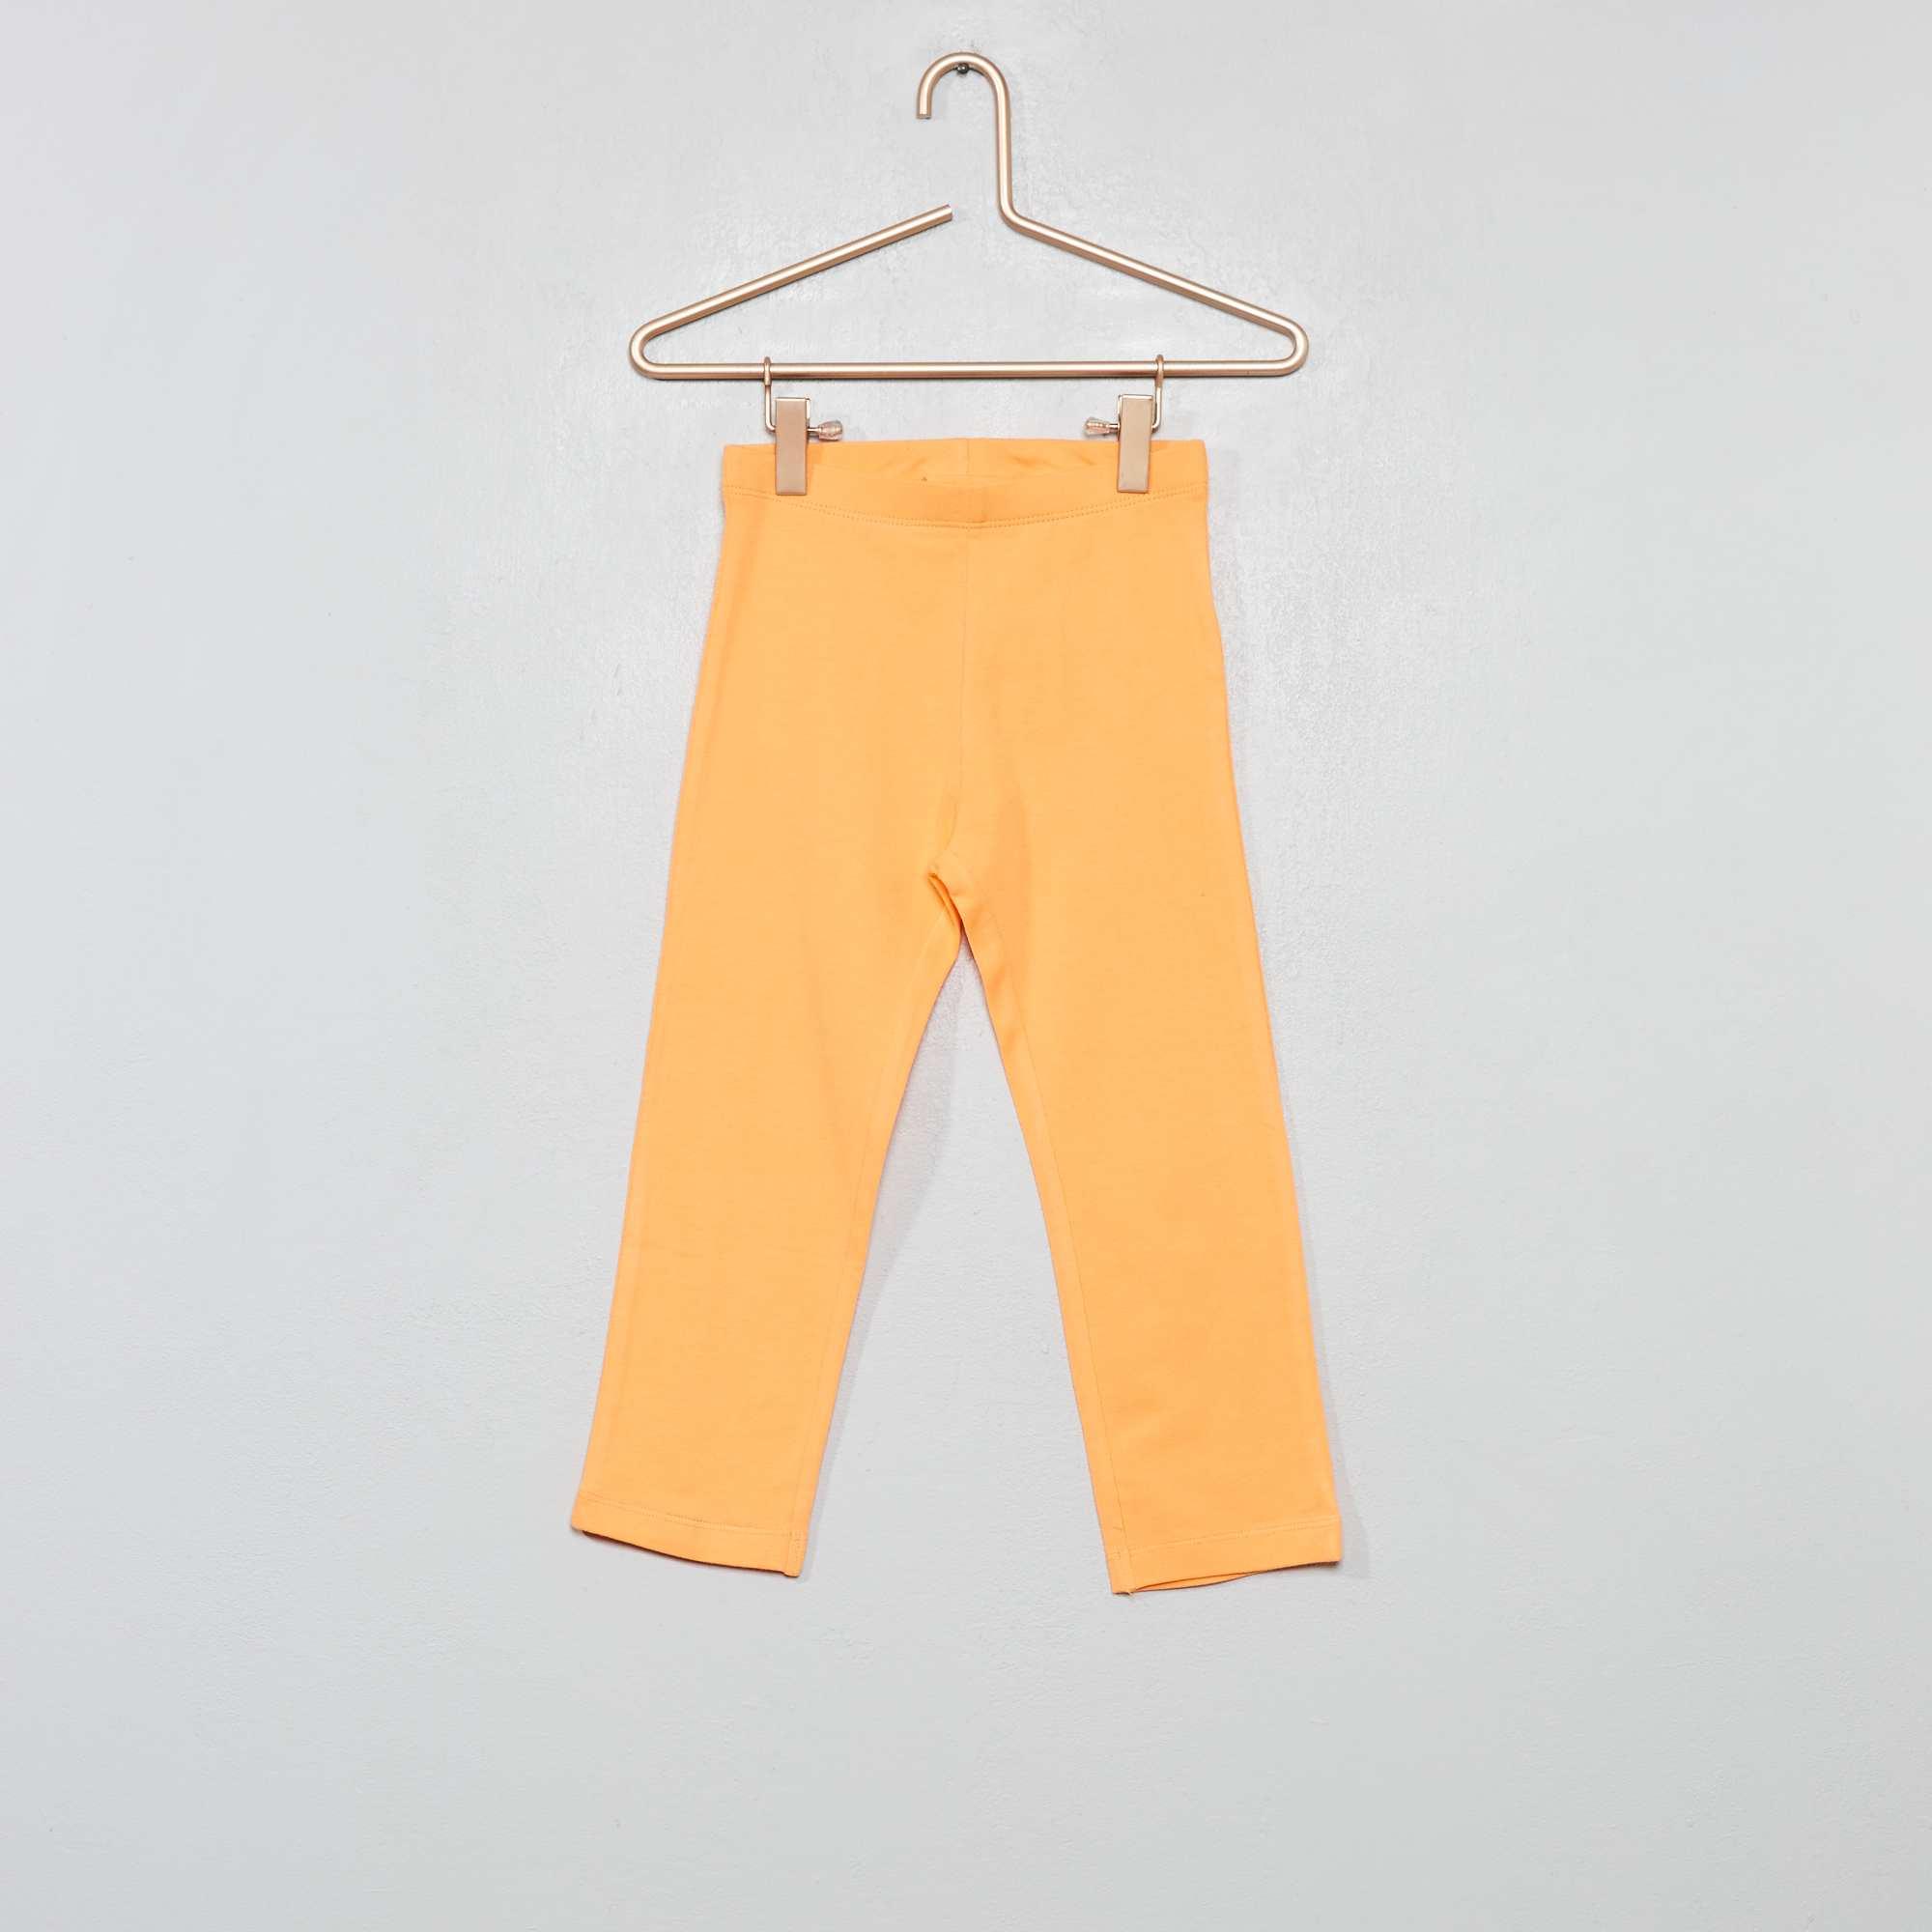 f3a3244eb Legging corto elástico Chica - naranja pálido - Kiabi - 3,00€